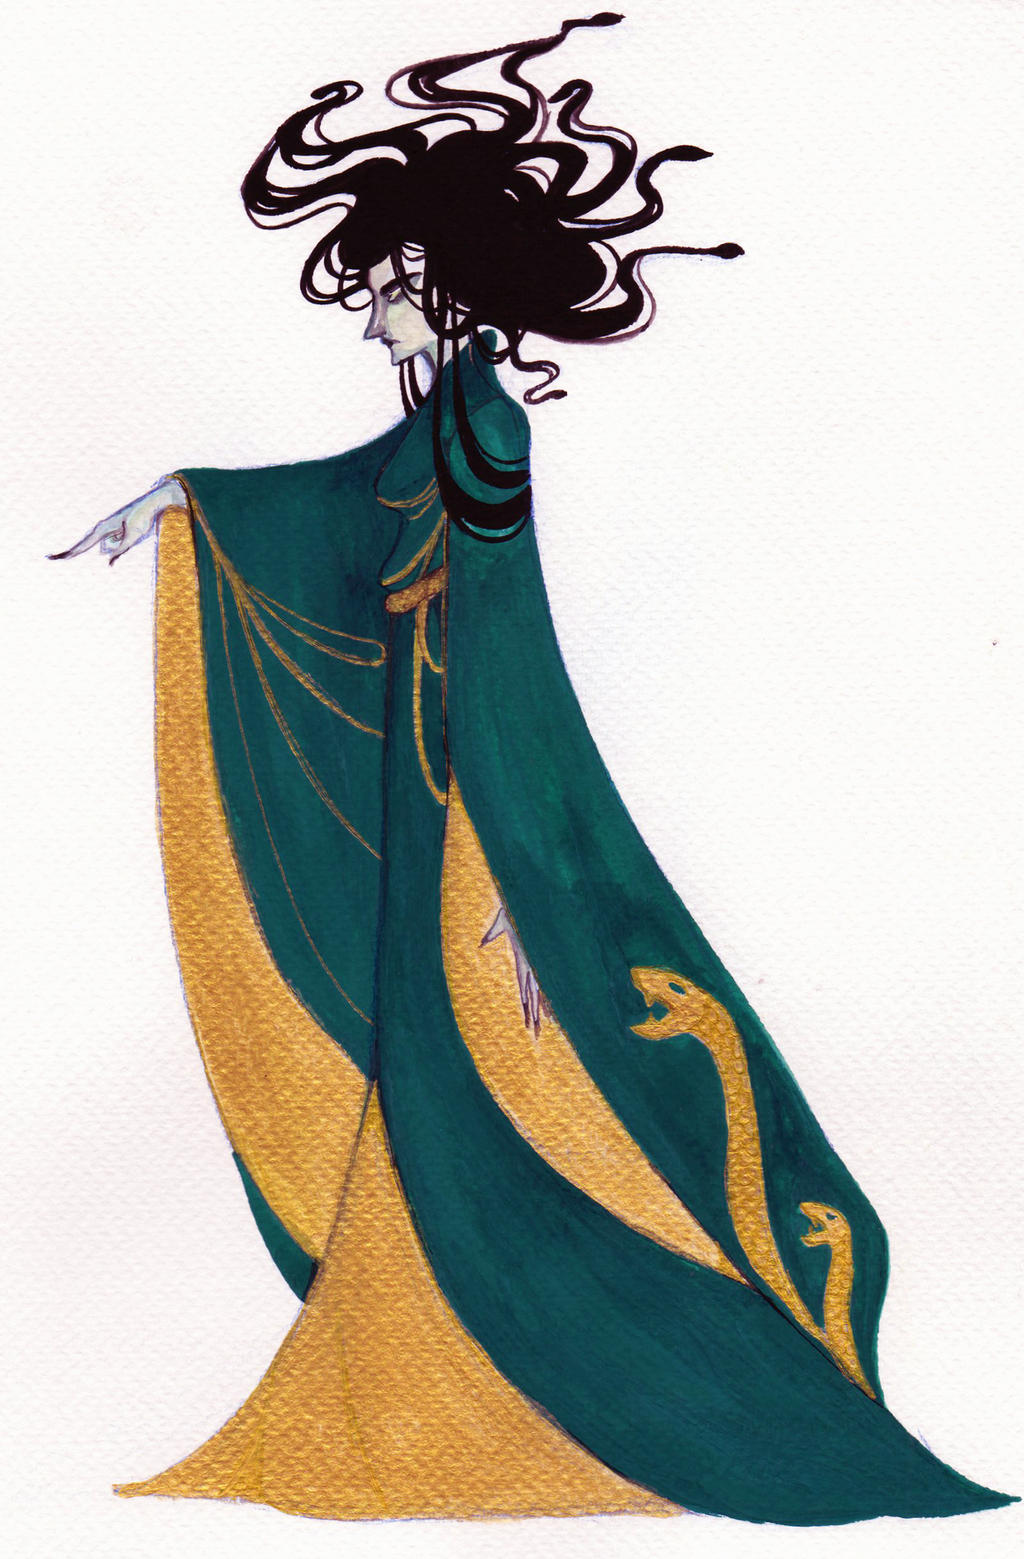 Medusa by Danicornio